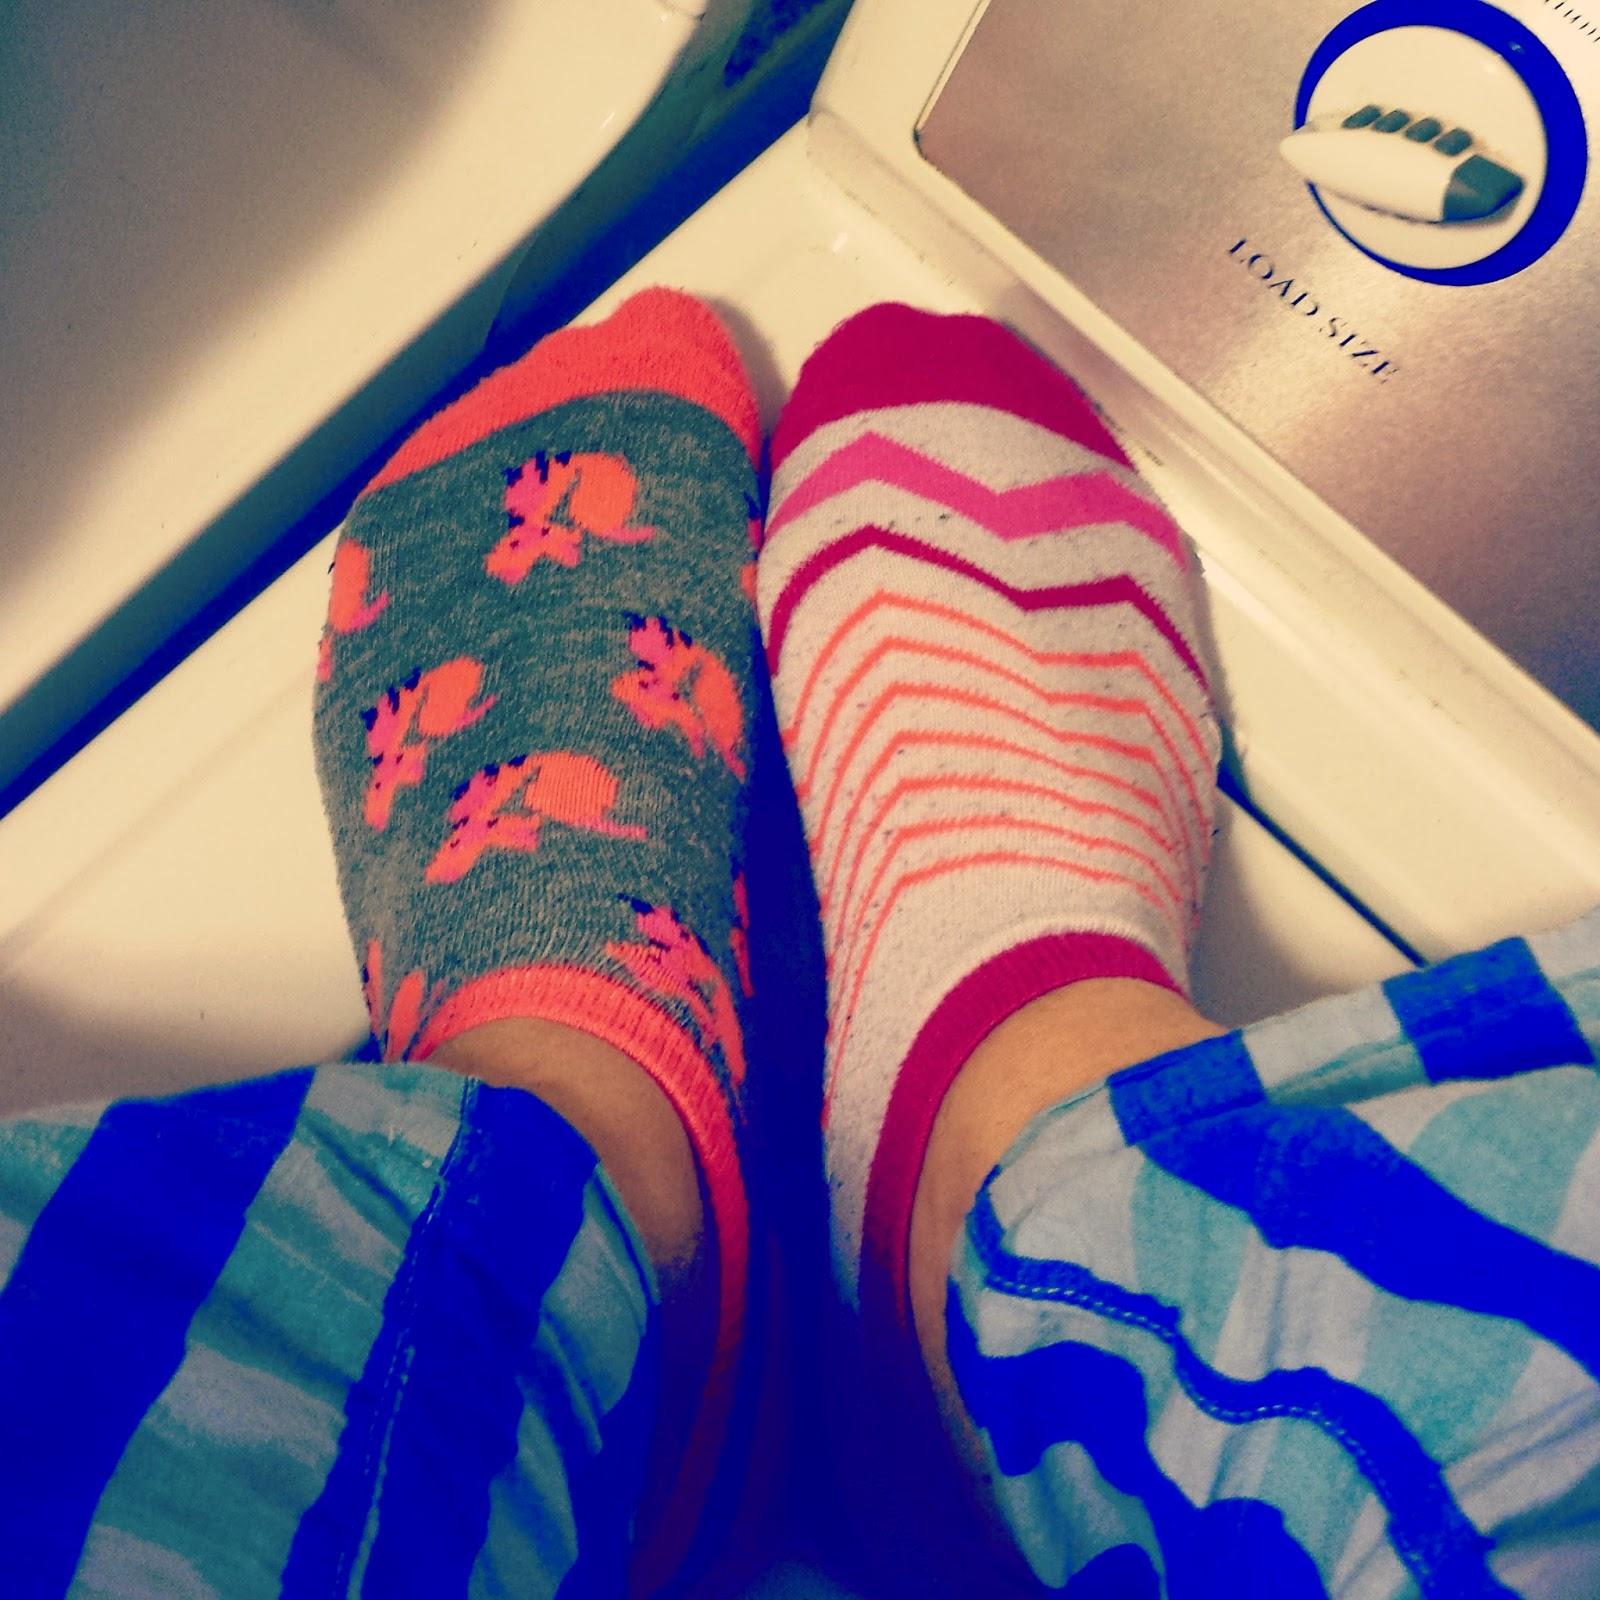 random, laundry, socks